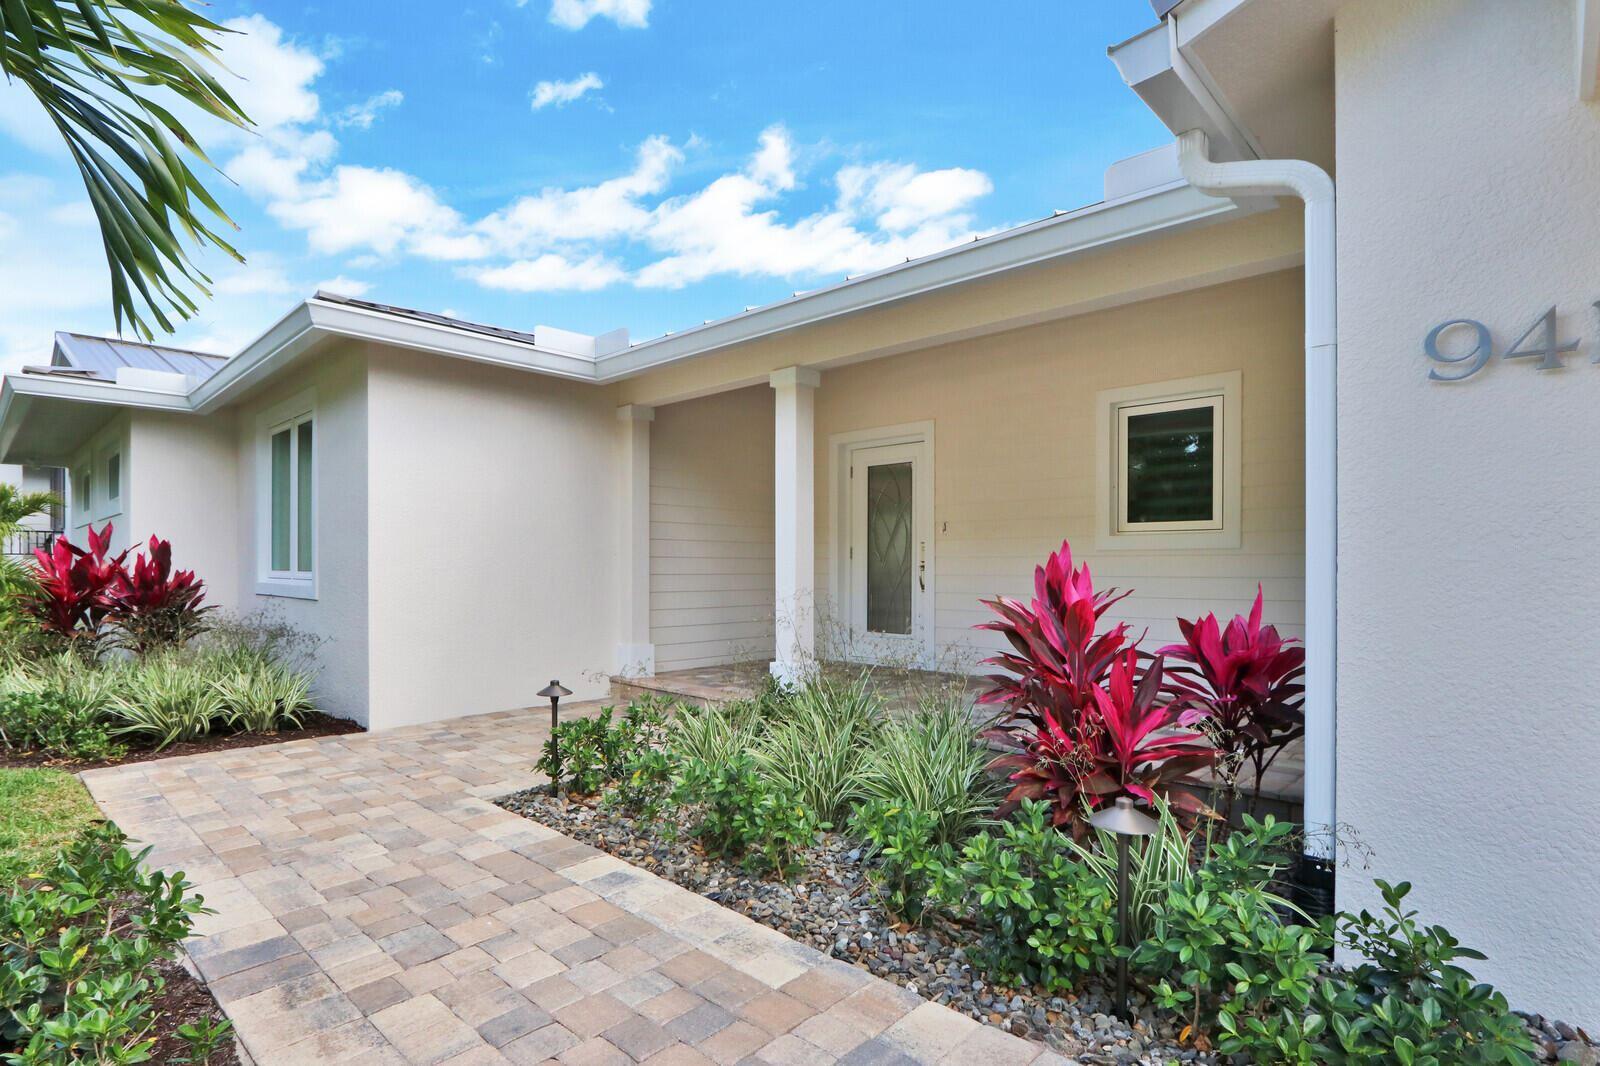 Photo of 941 SW Pine Tree Lane, Palm City, FL 34990 (MLS # RX-10706986)